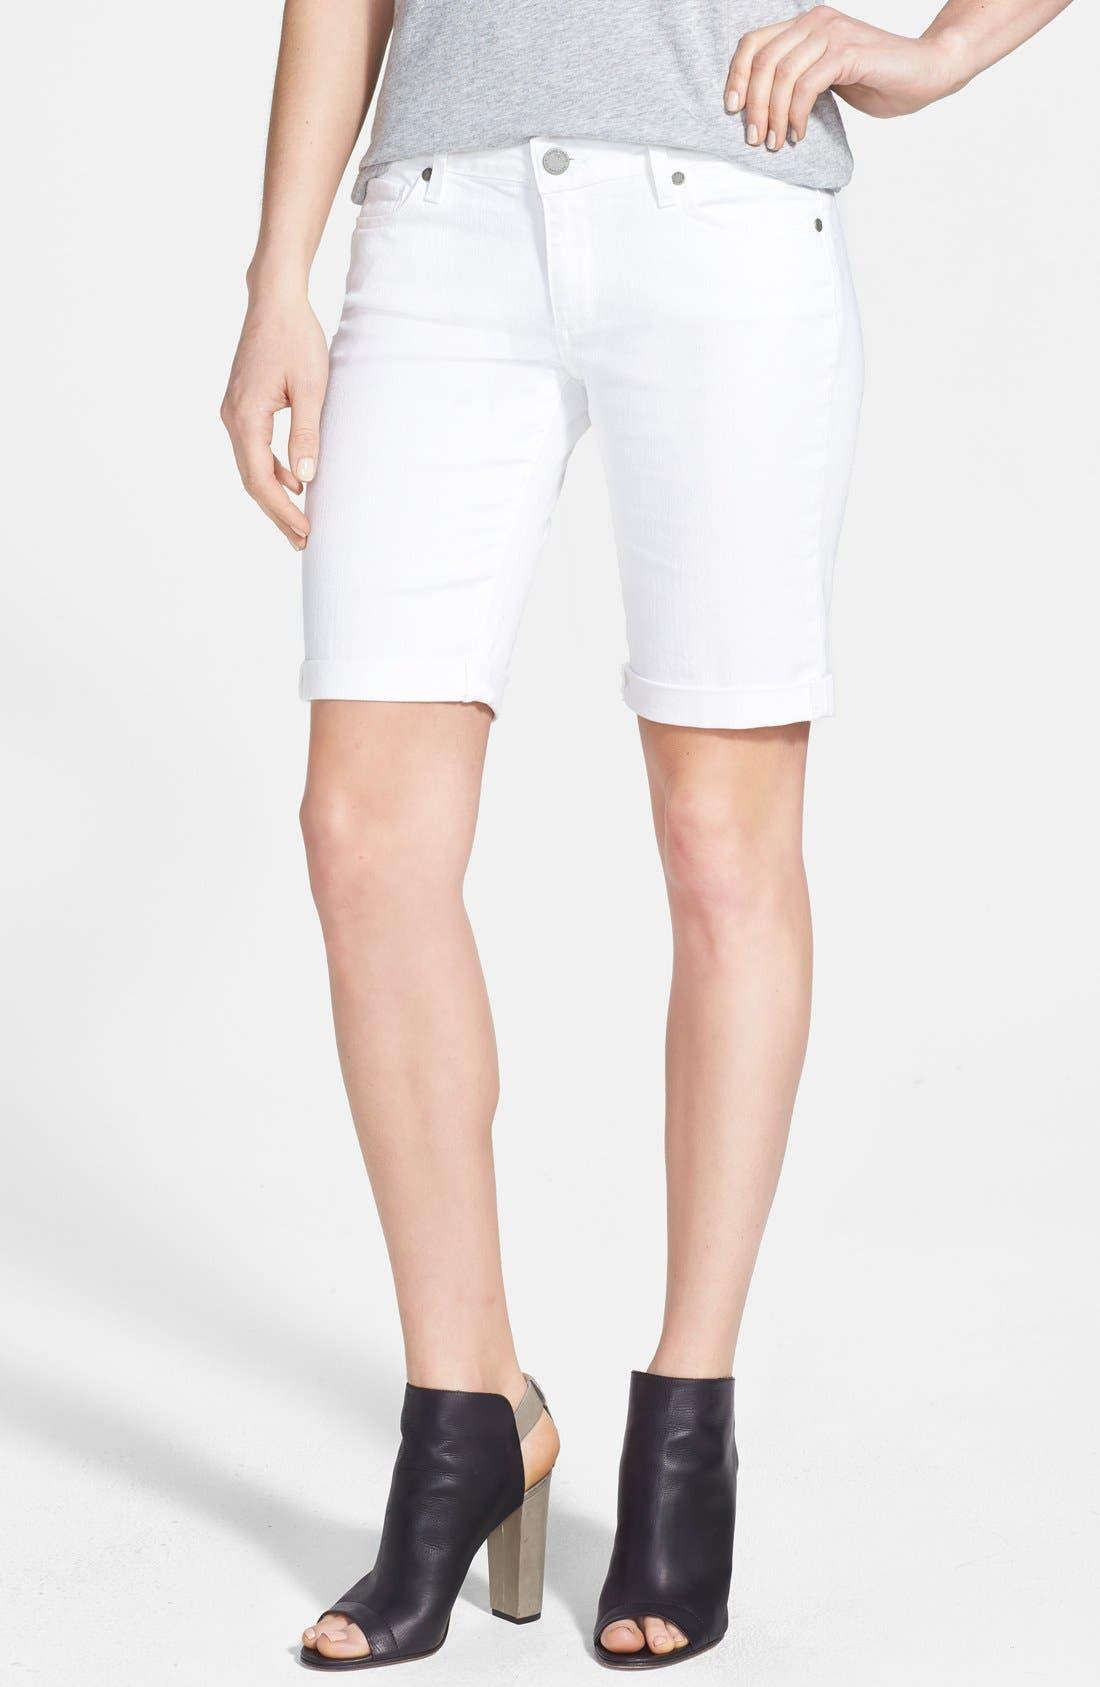 Alternate Image 1 Selected - PAIGE 'Jax' Stretch Denim Bermuda Shorts (Optic White)